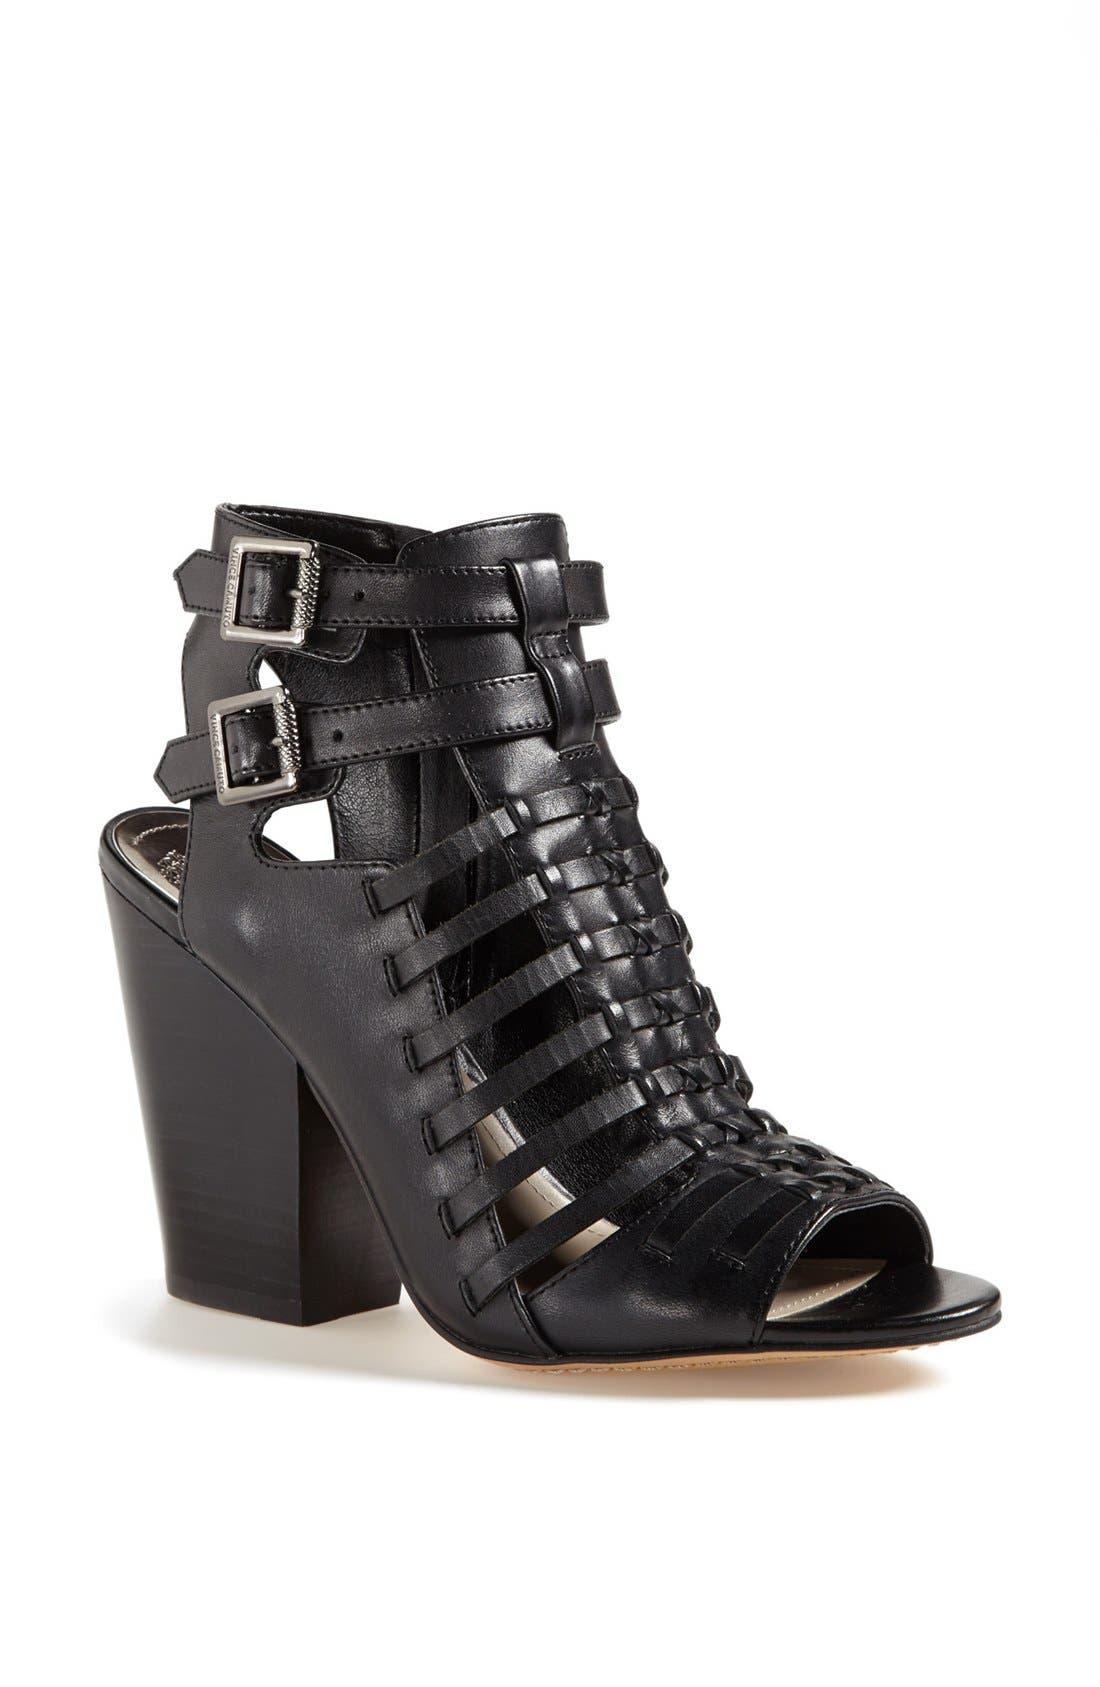 Alternate Image 1 Selected - Vince Camuto 'Medow' Sandal